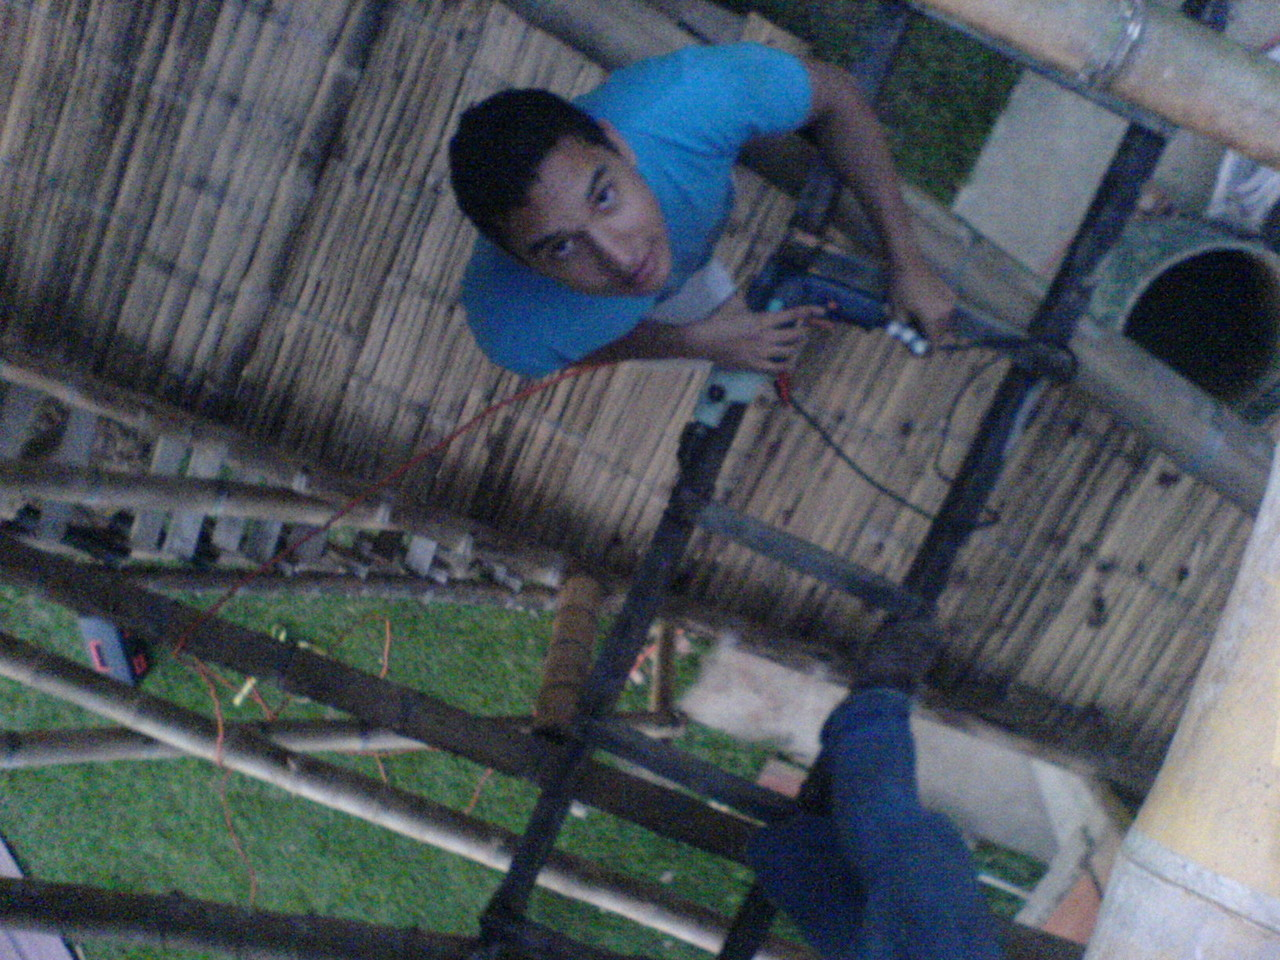 Raul, Kenia